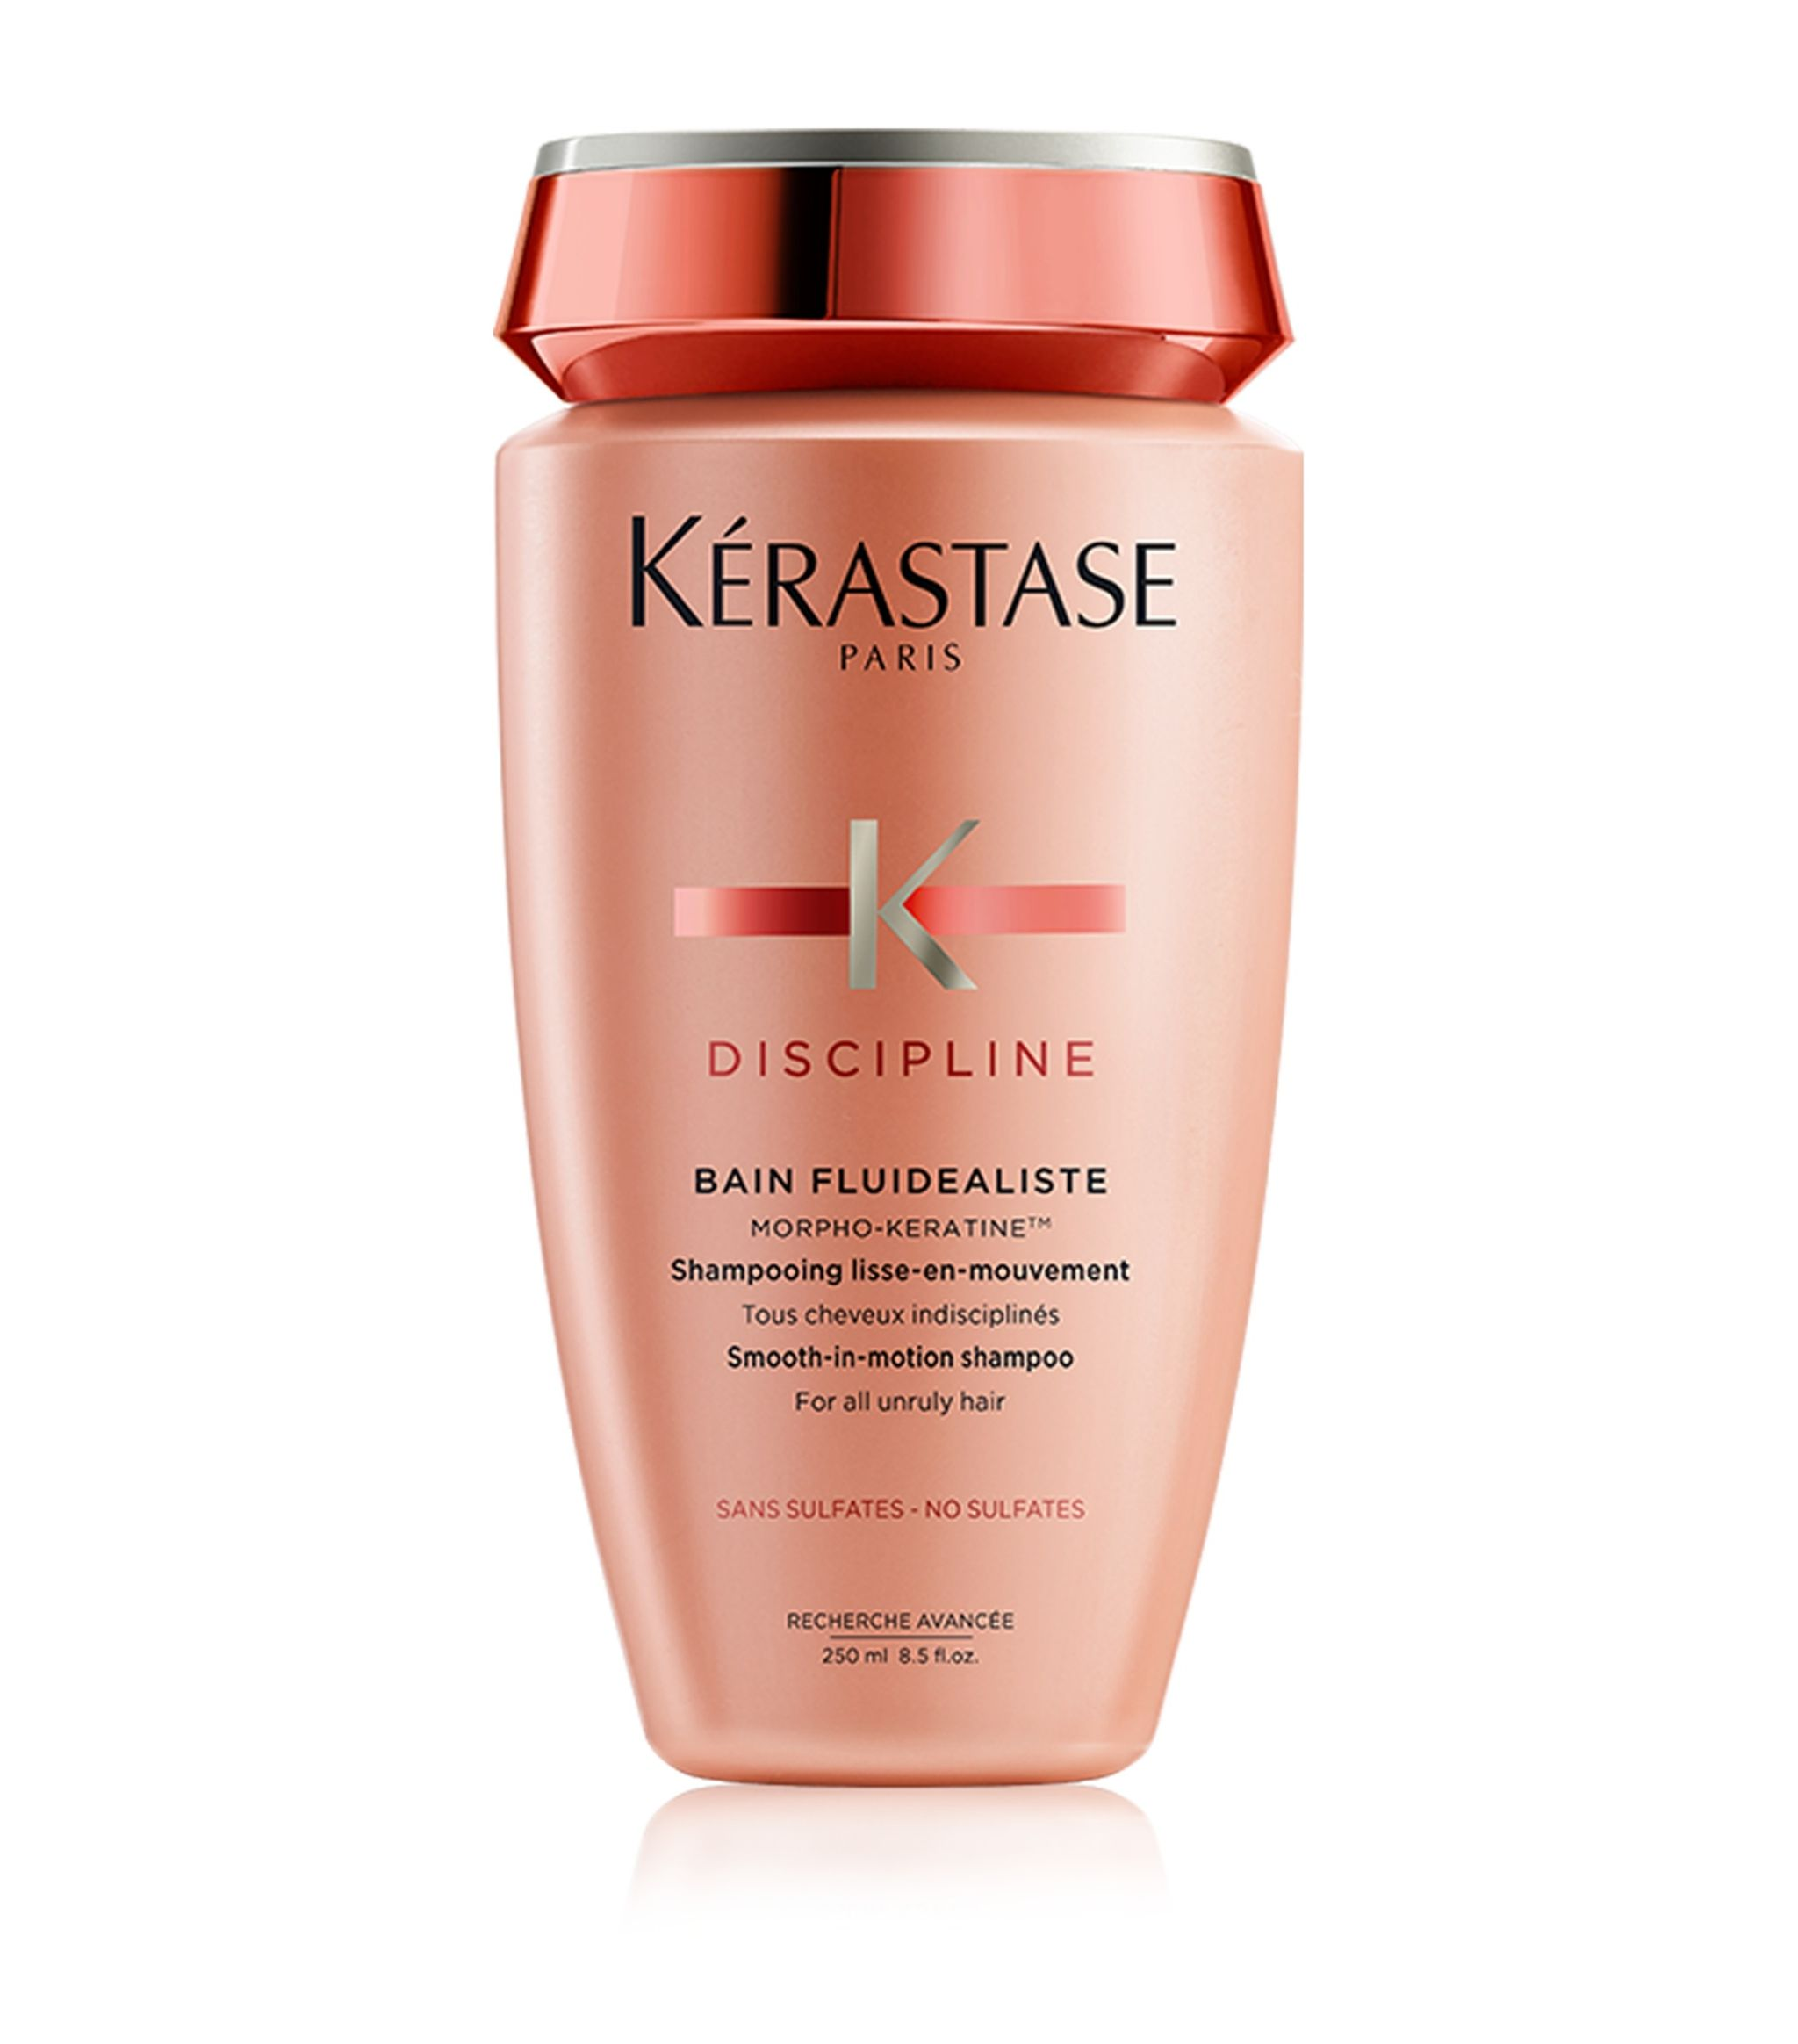 Kérastase - BAIN FLUIDEALISTE SULFATES FREE - 250 ML